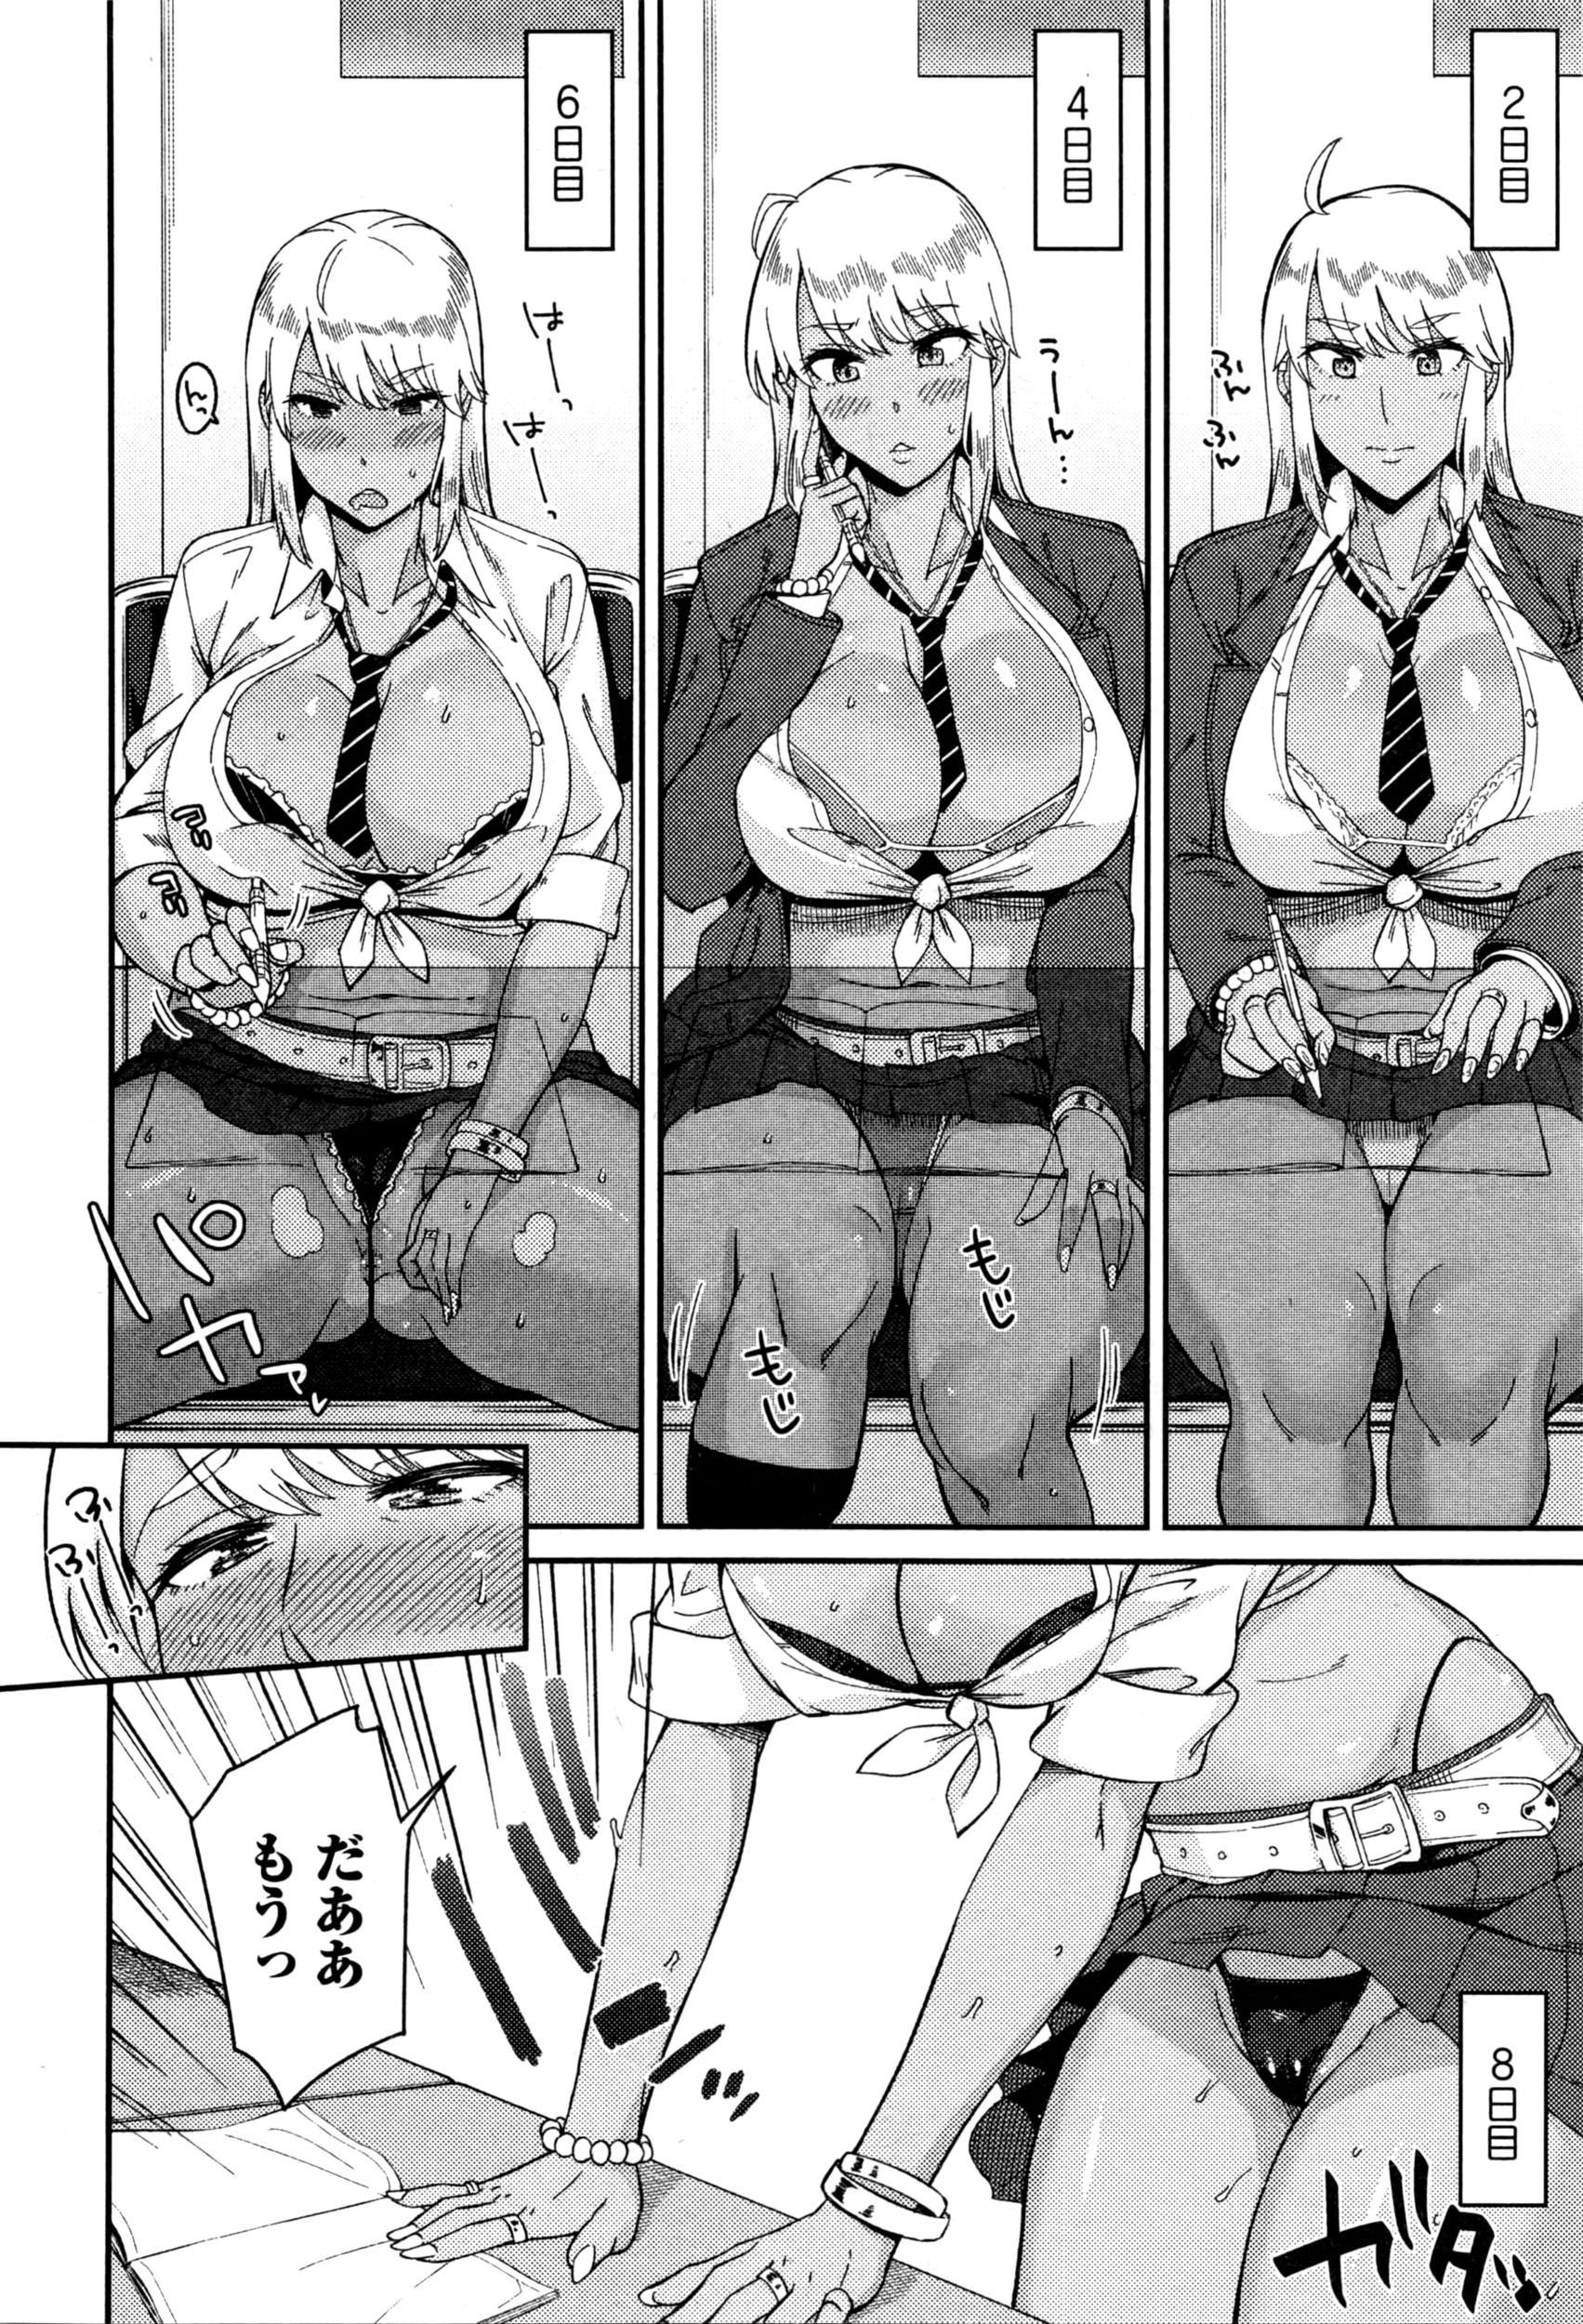 Comic JSCK Vol.3 2016-03 52